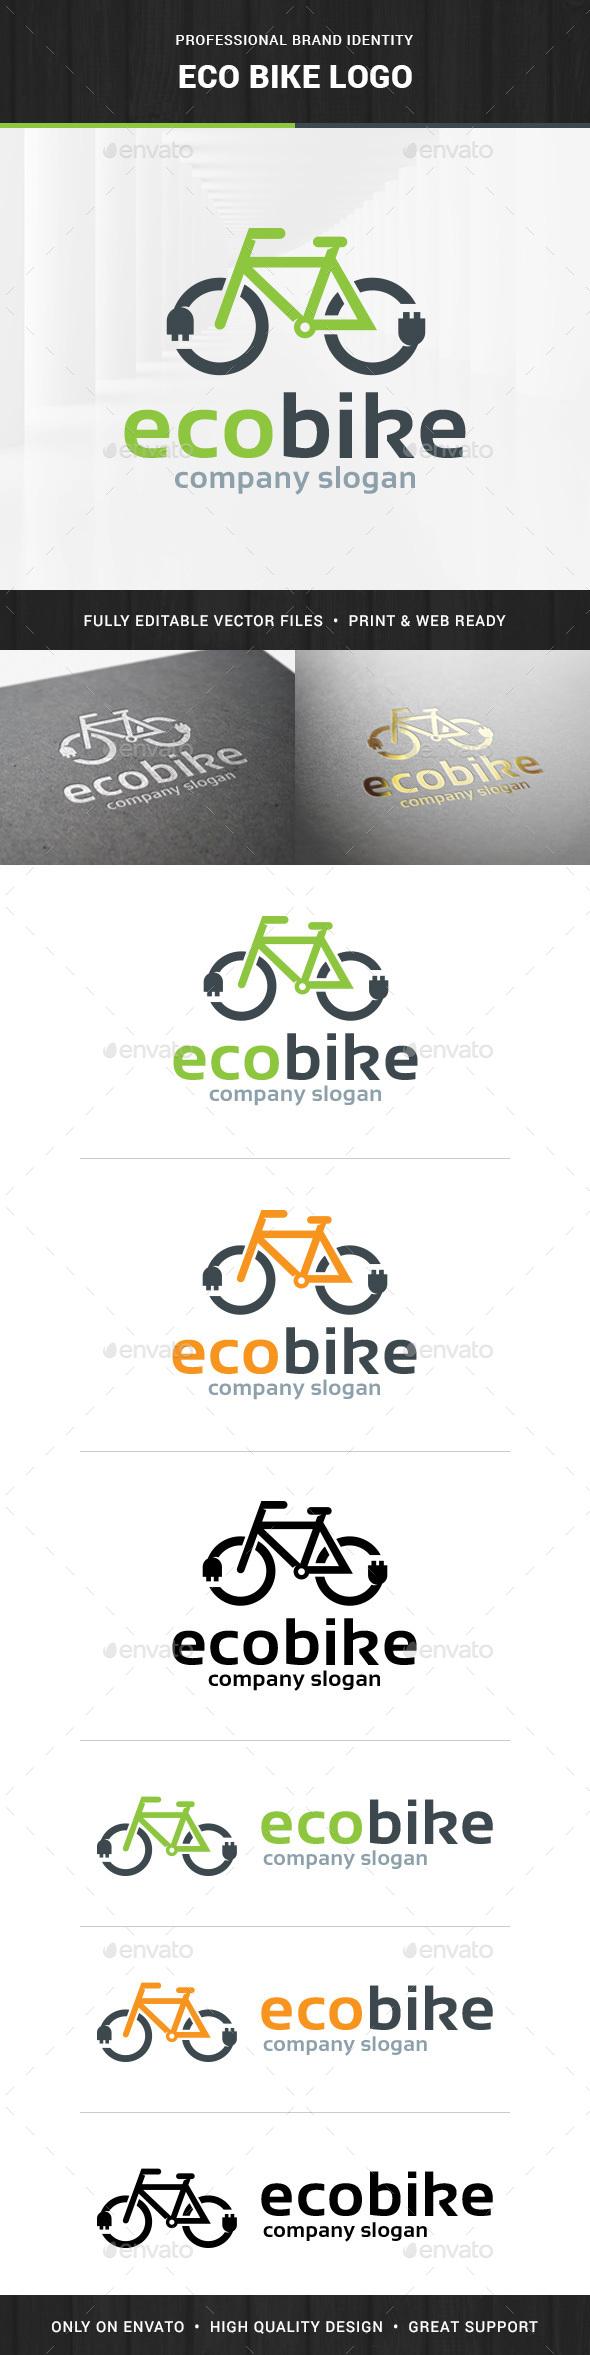 Eco Bike Logo Template